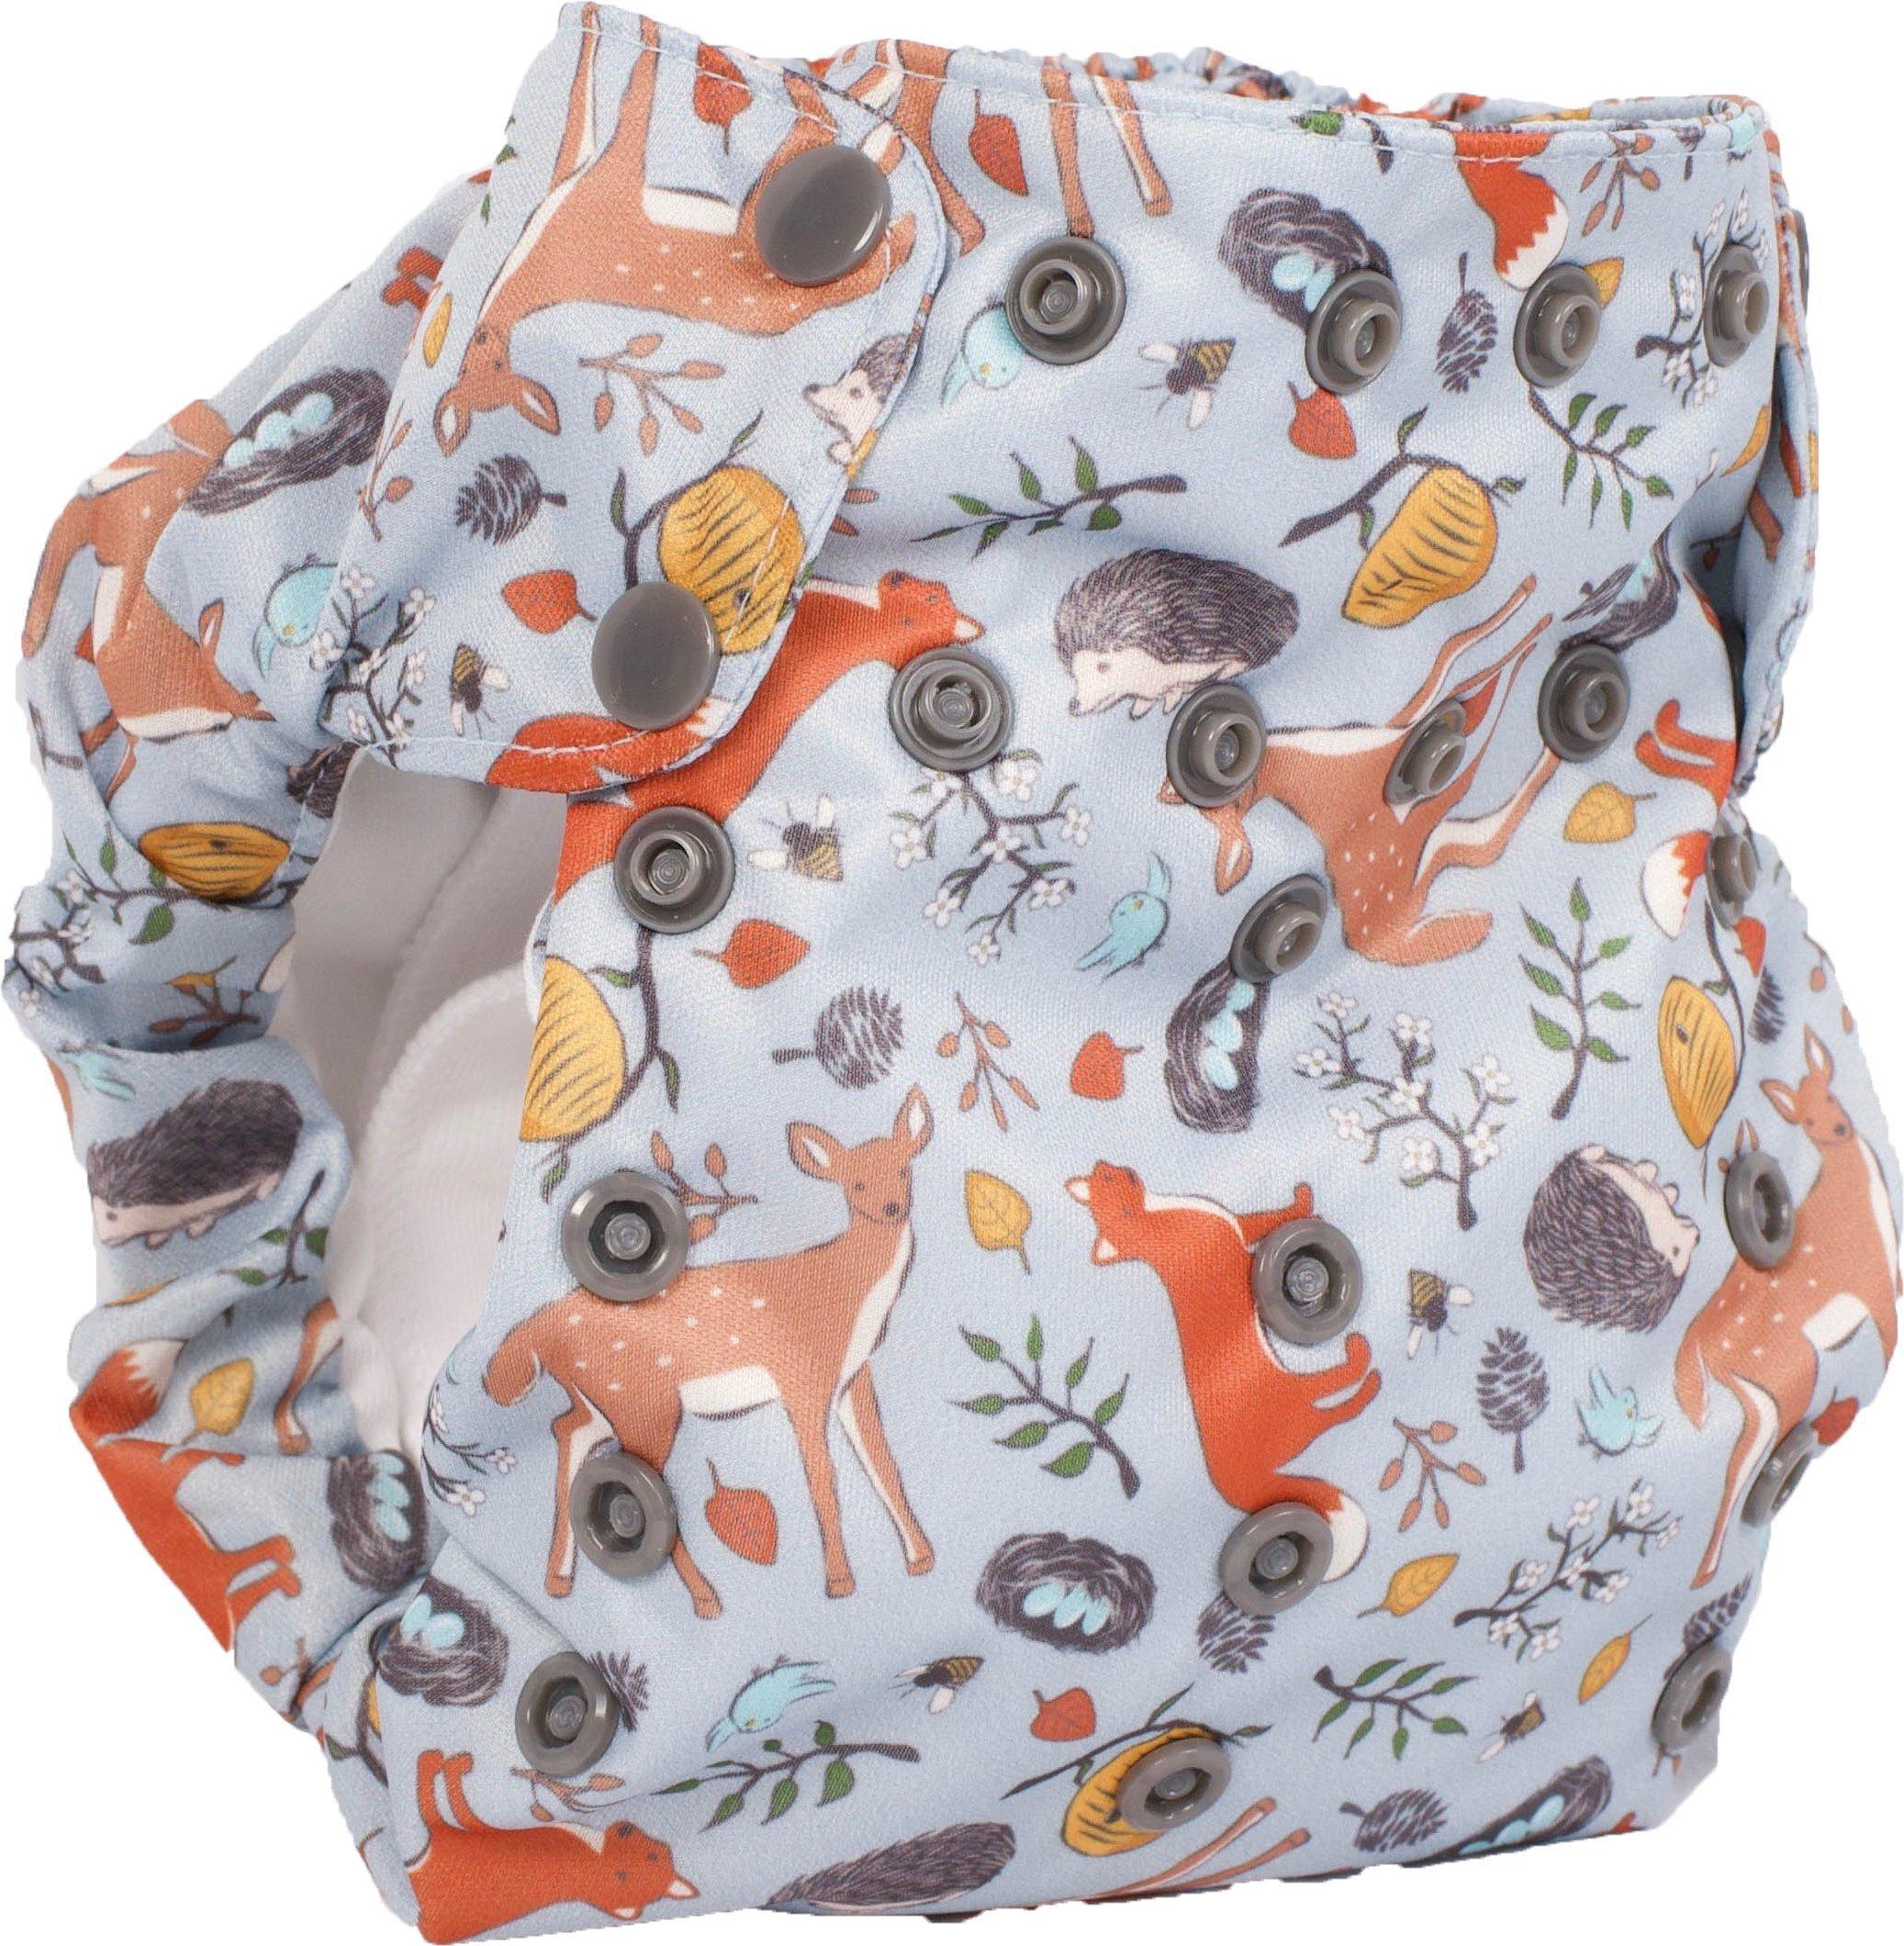 Smart Bottoms Dream Diaper 2.0 No Prep Organic Cloth Diaper